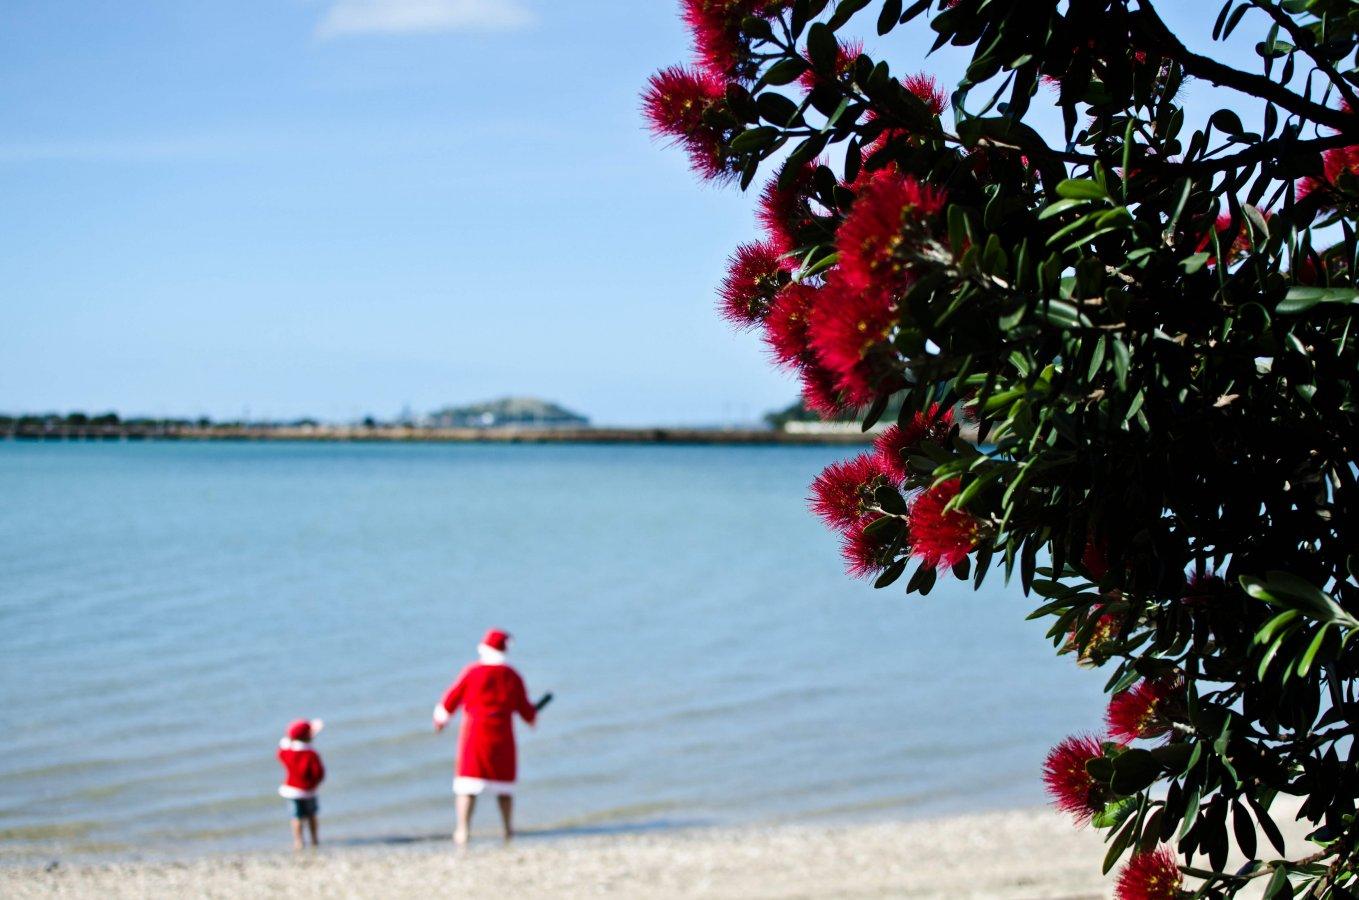 2 Santas on the beach in New Zealand, unfocused behind a wattle tree